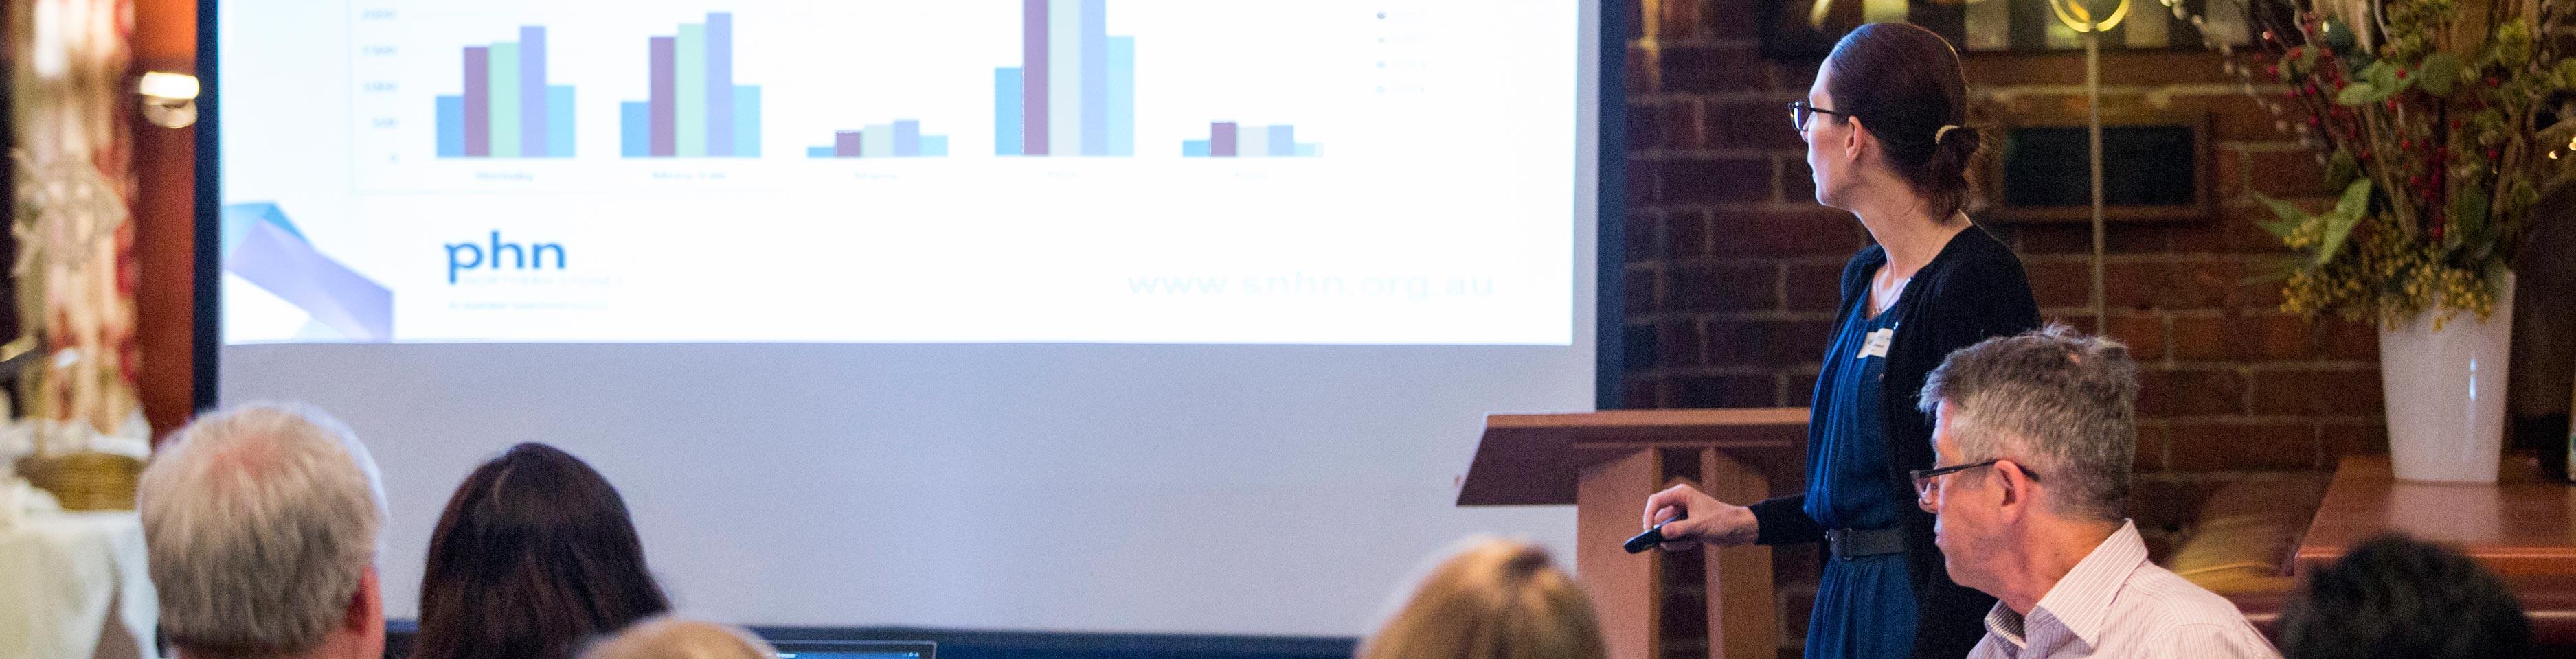 A presentation at a PHN event